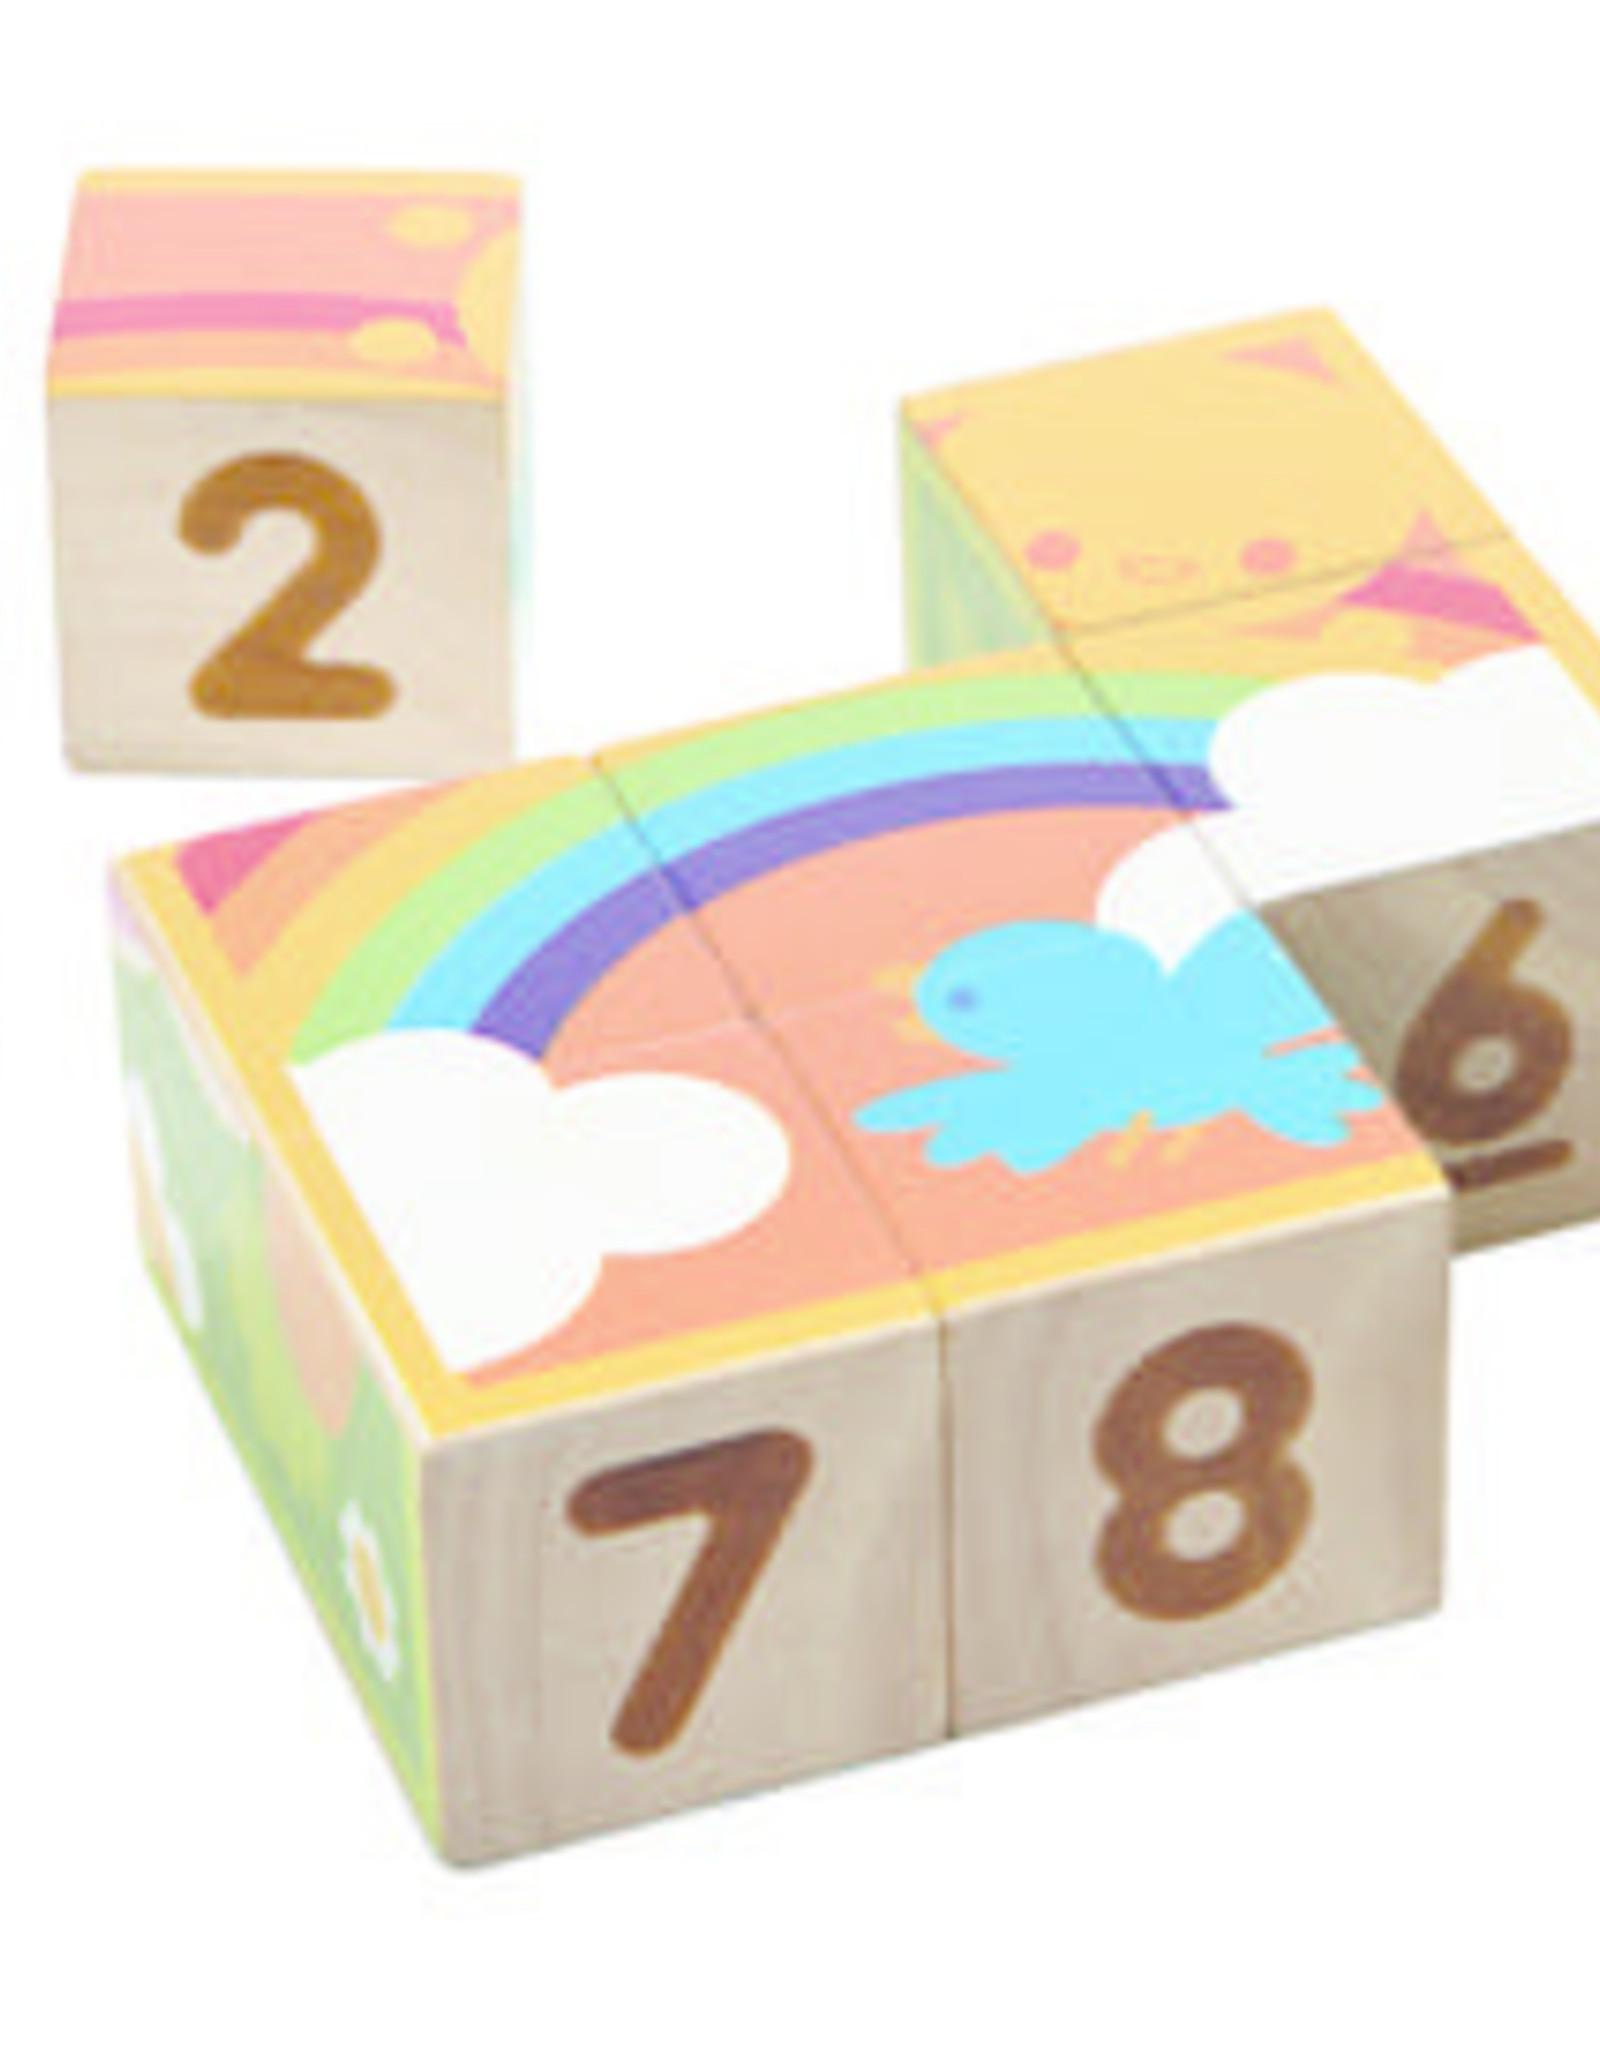 Plan Toys Plan Toys - PUZZEL - KUBUSJES